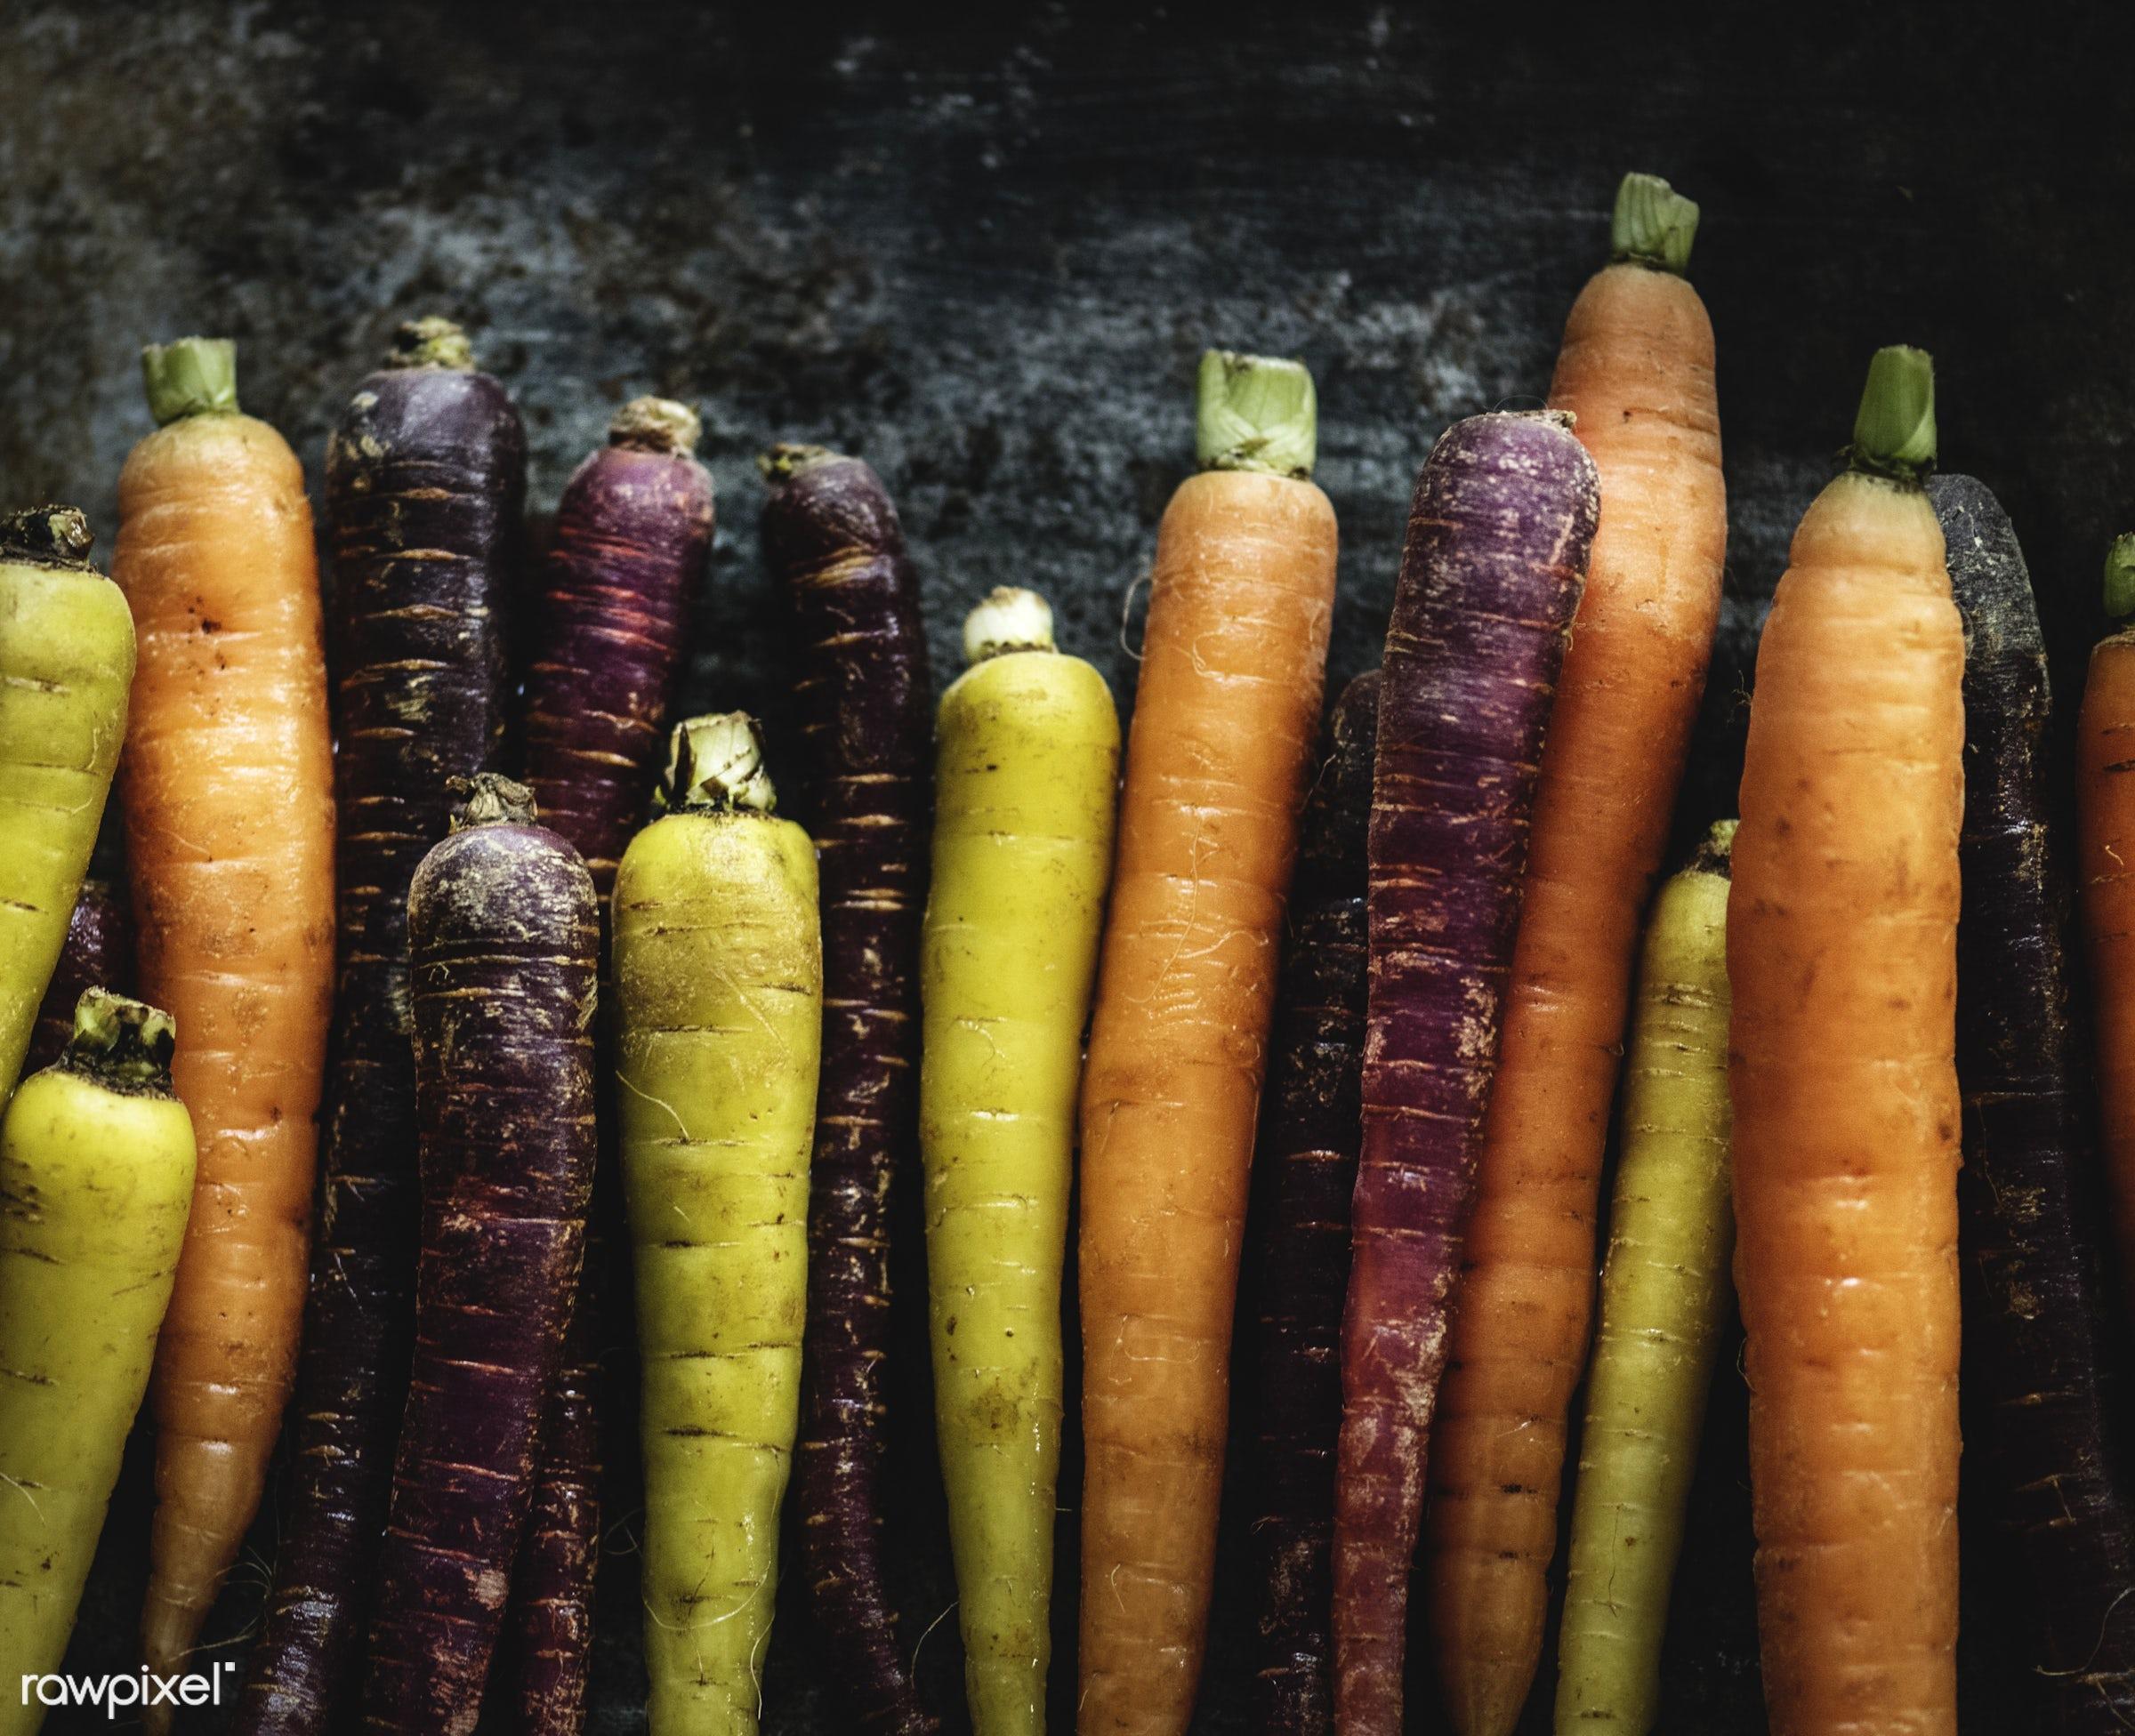 raw, carrot, root, fiber, fresh, ingredient, culinary, veggies, edible, nutrition, organic, food, healthy, vegetable, natural